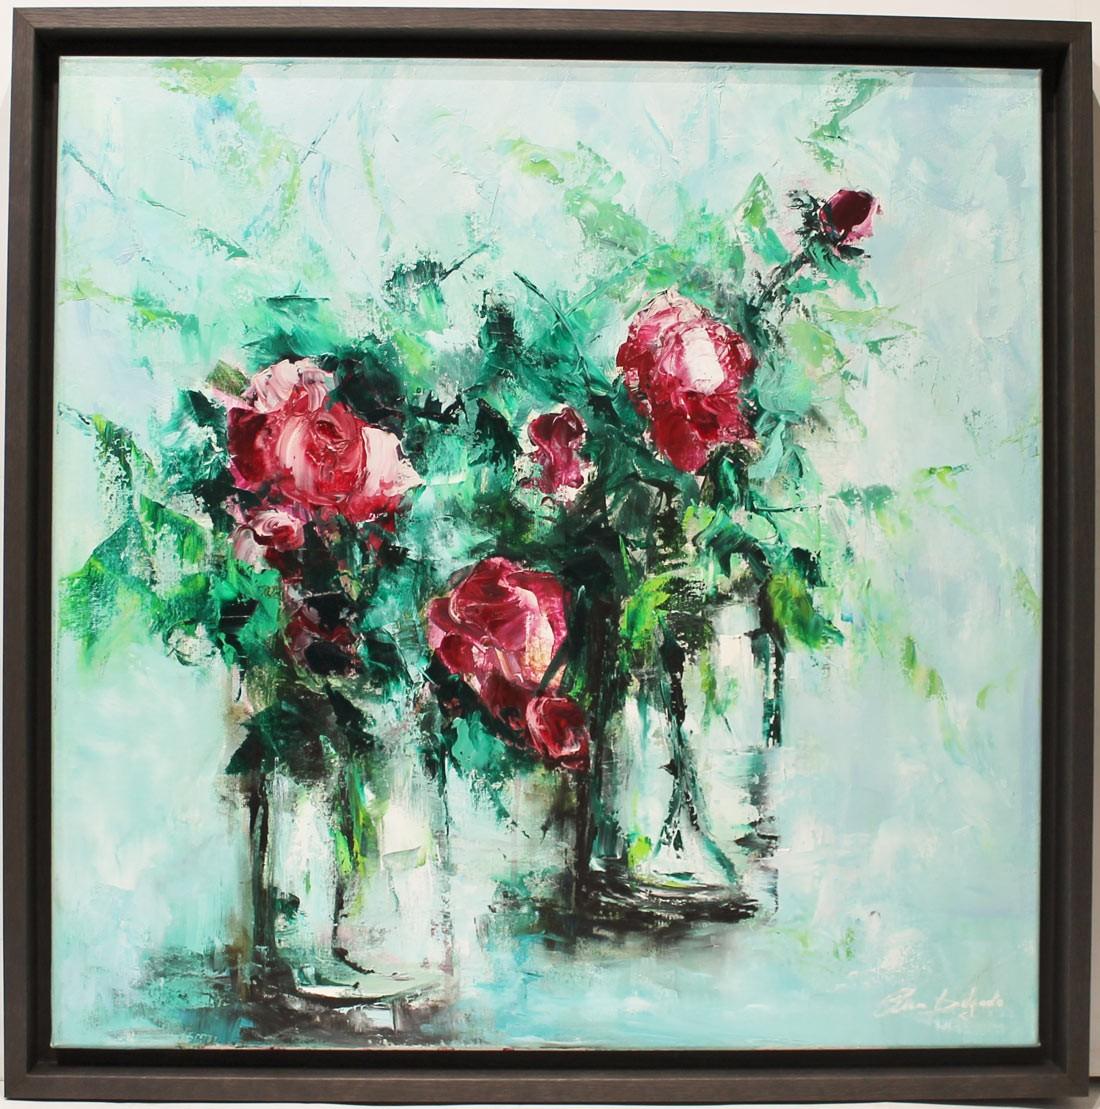 Ana Delgado: Rosas rojas